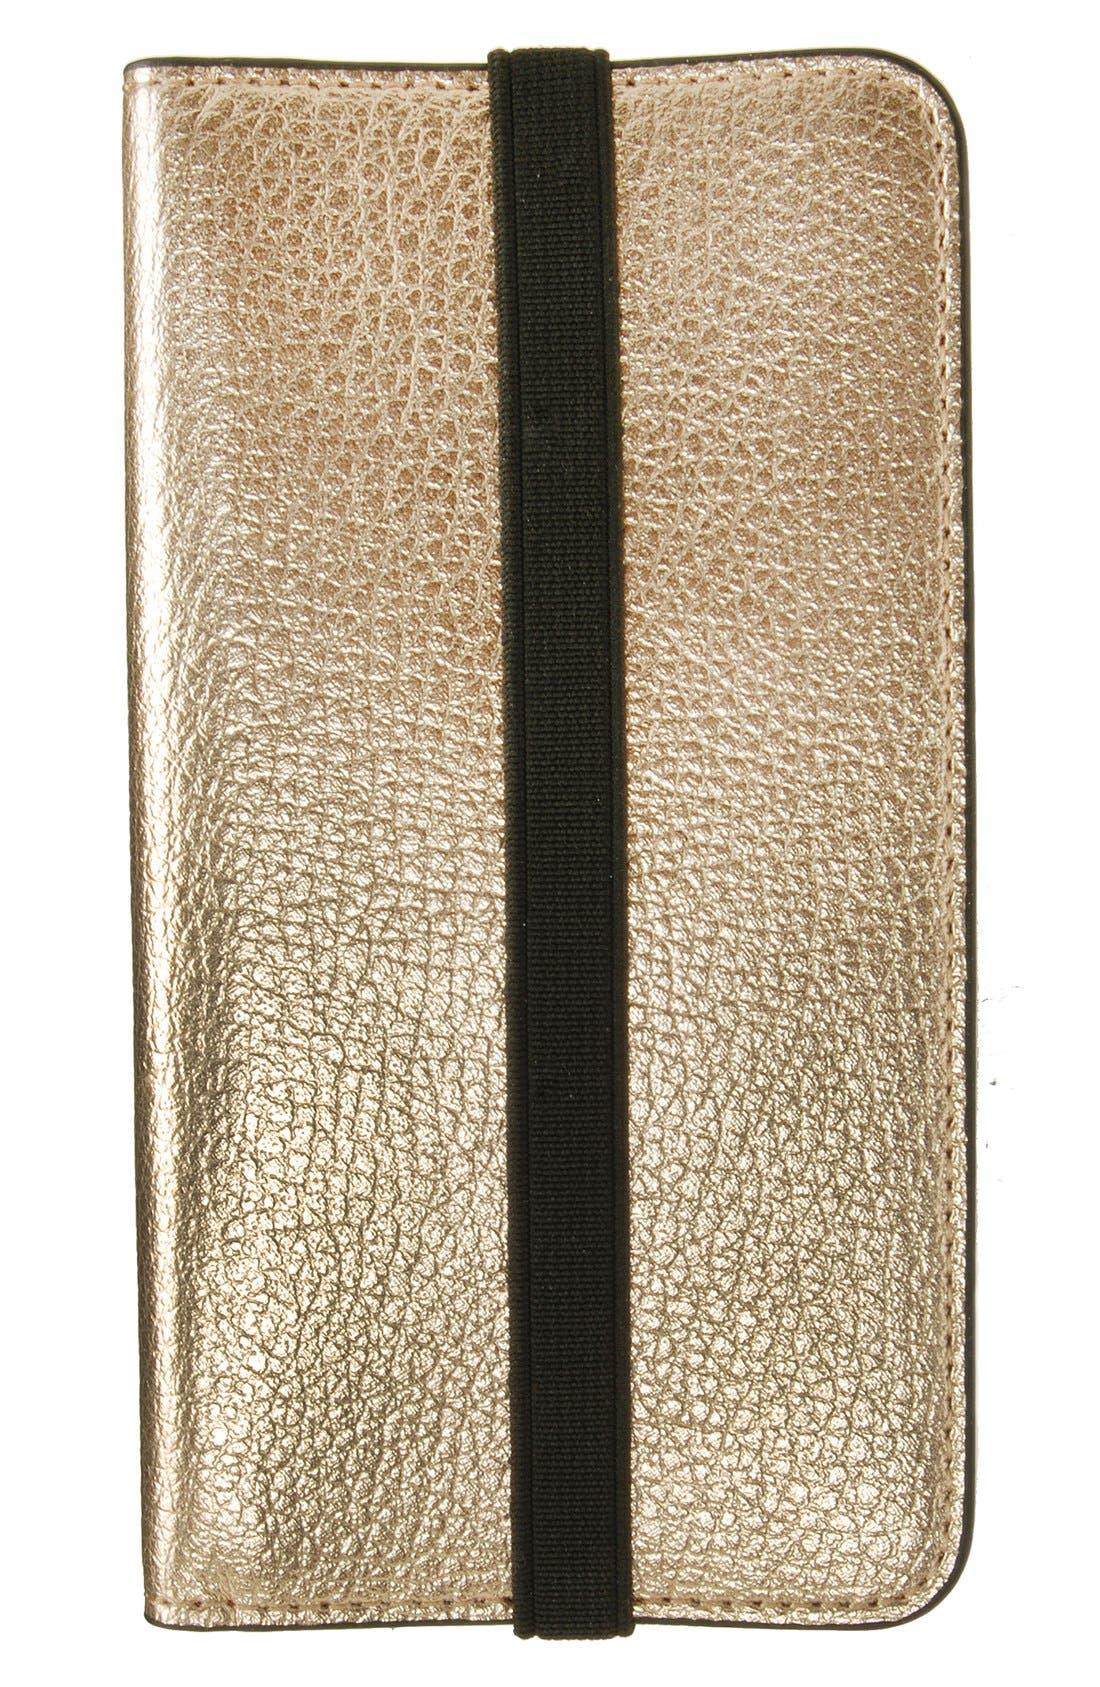 Mobileluxe iPhone 6/6s Metallic Leather Wallet Case